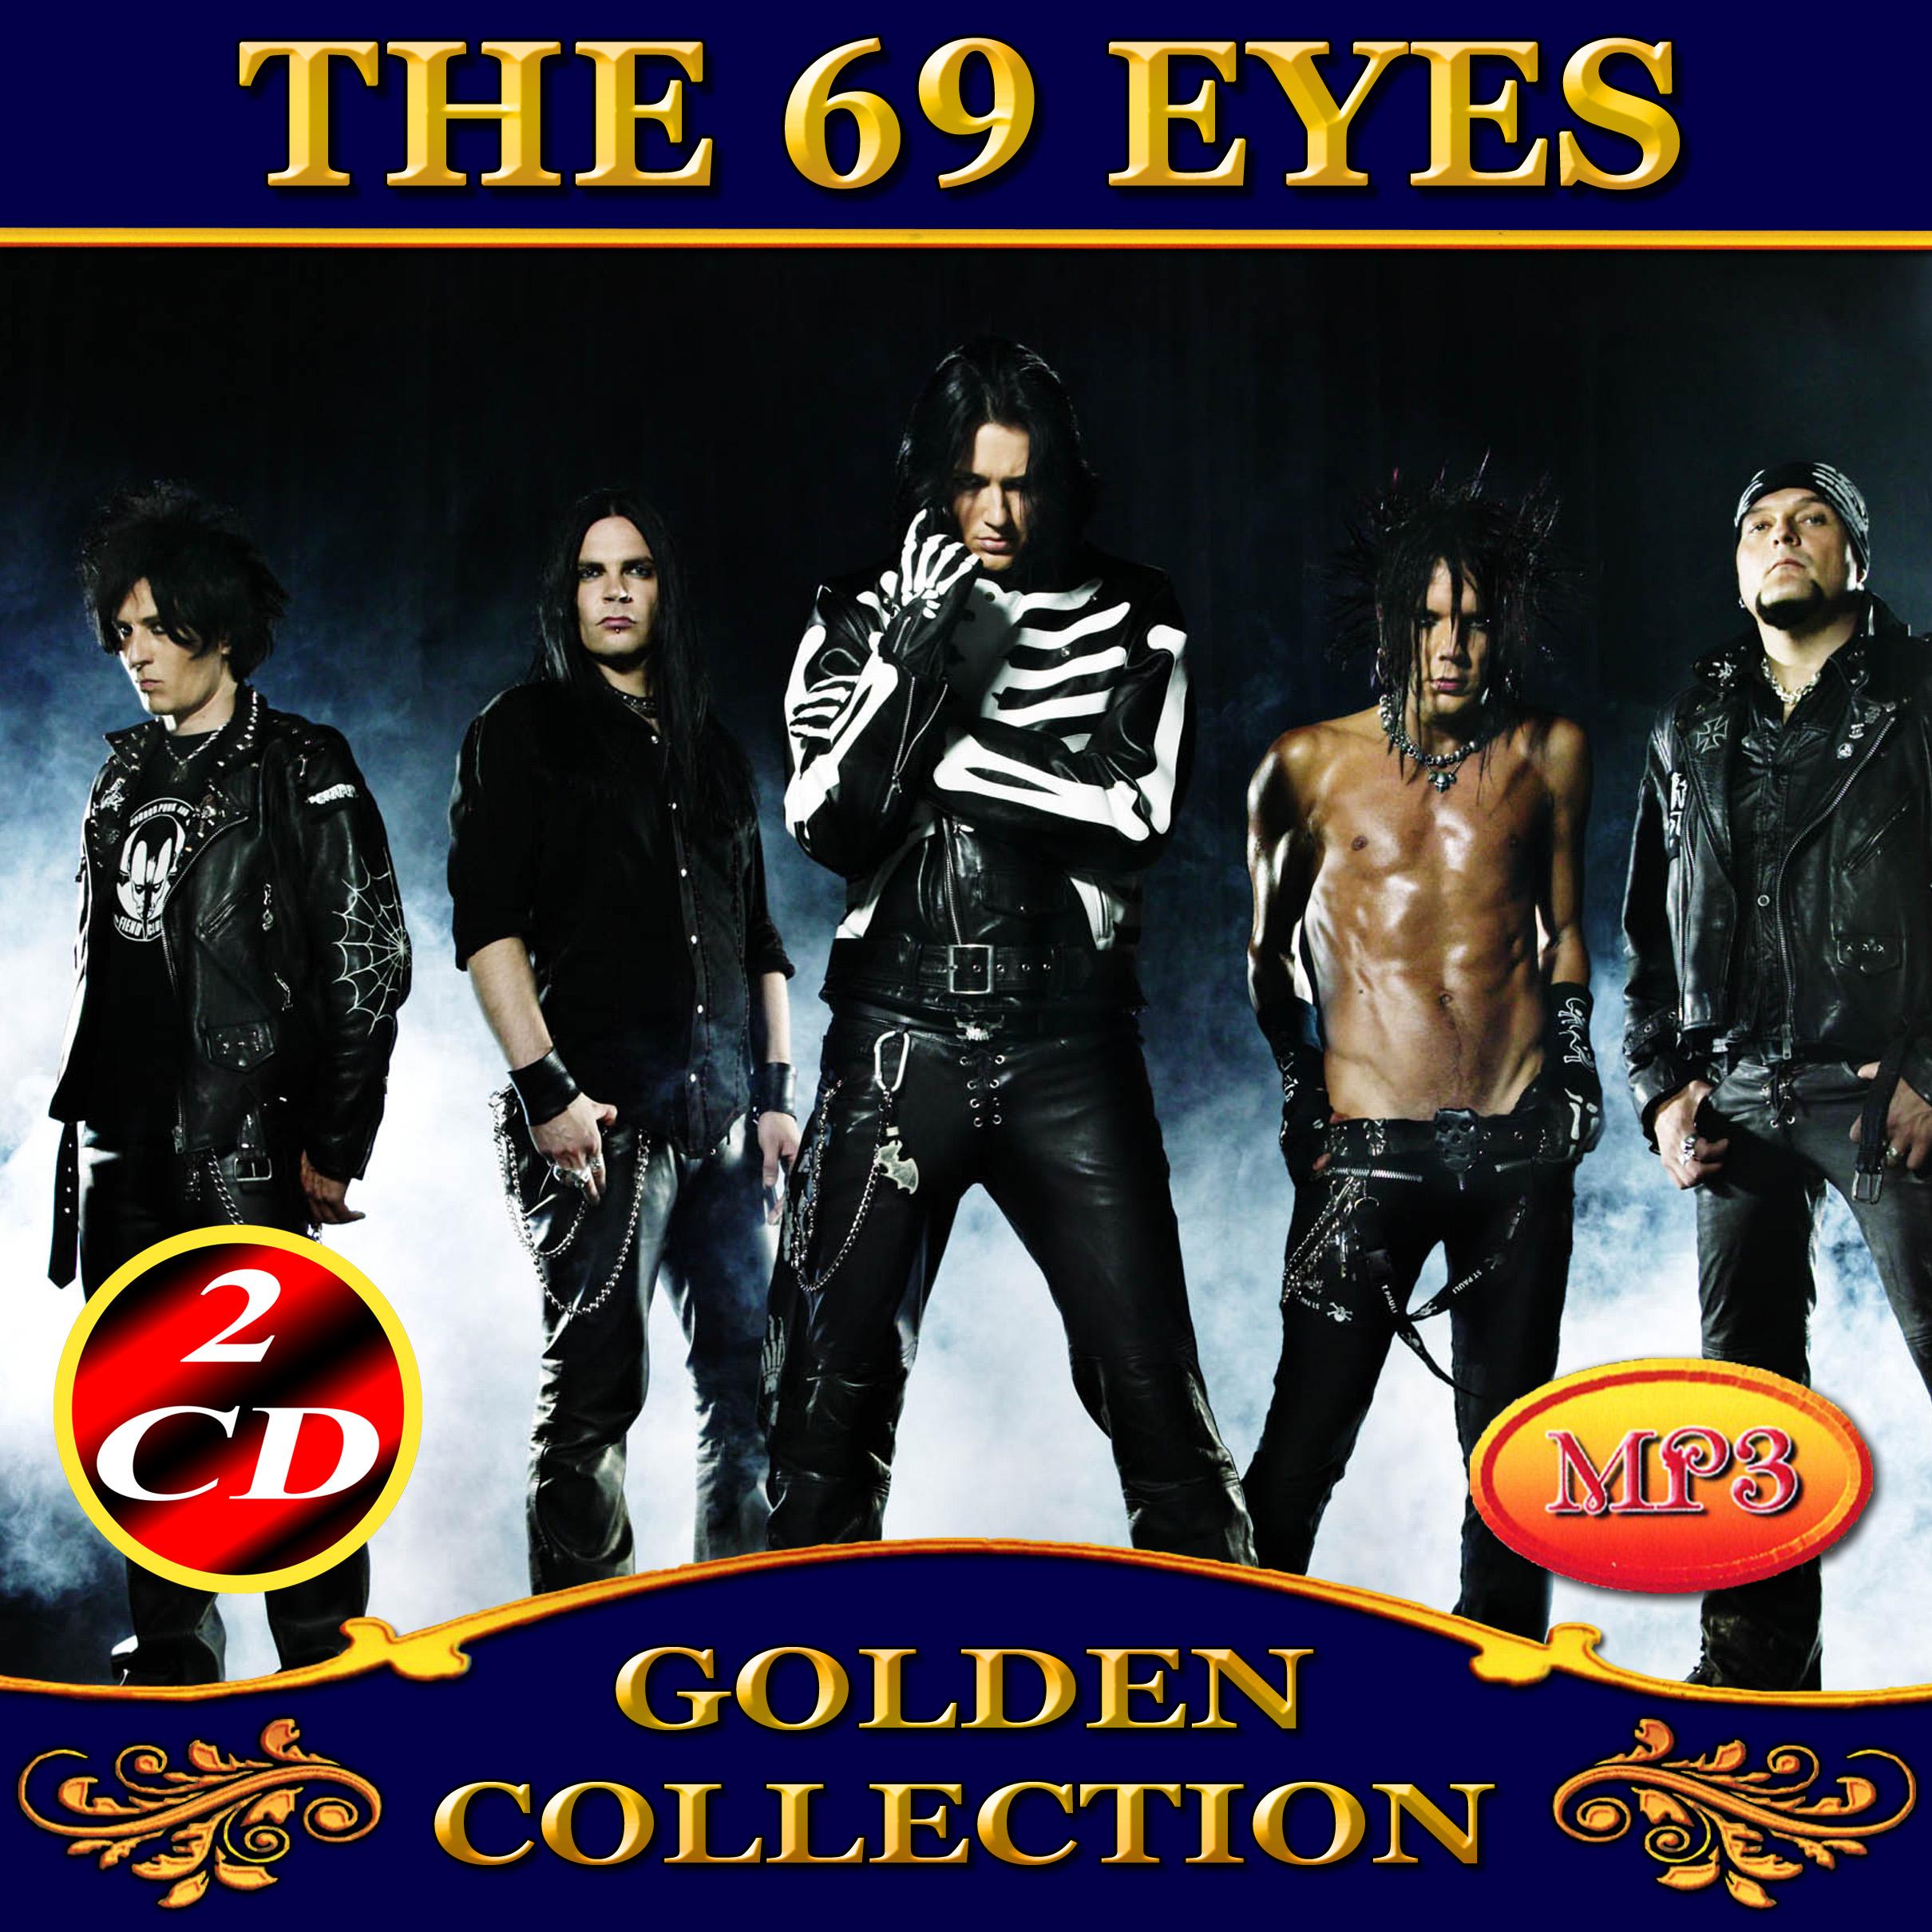 The 69 Eyes 2cd [mp3]